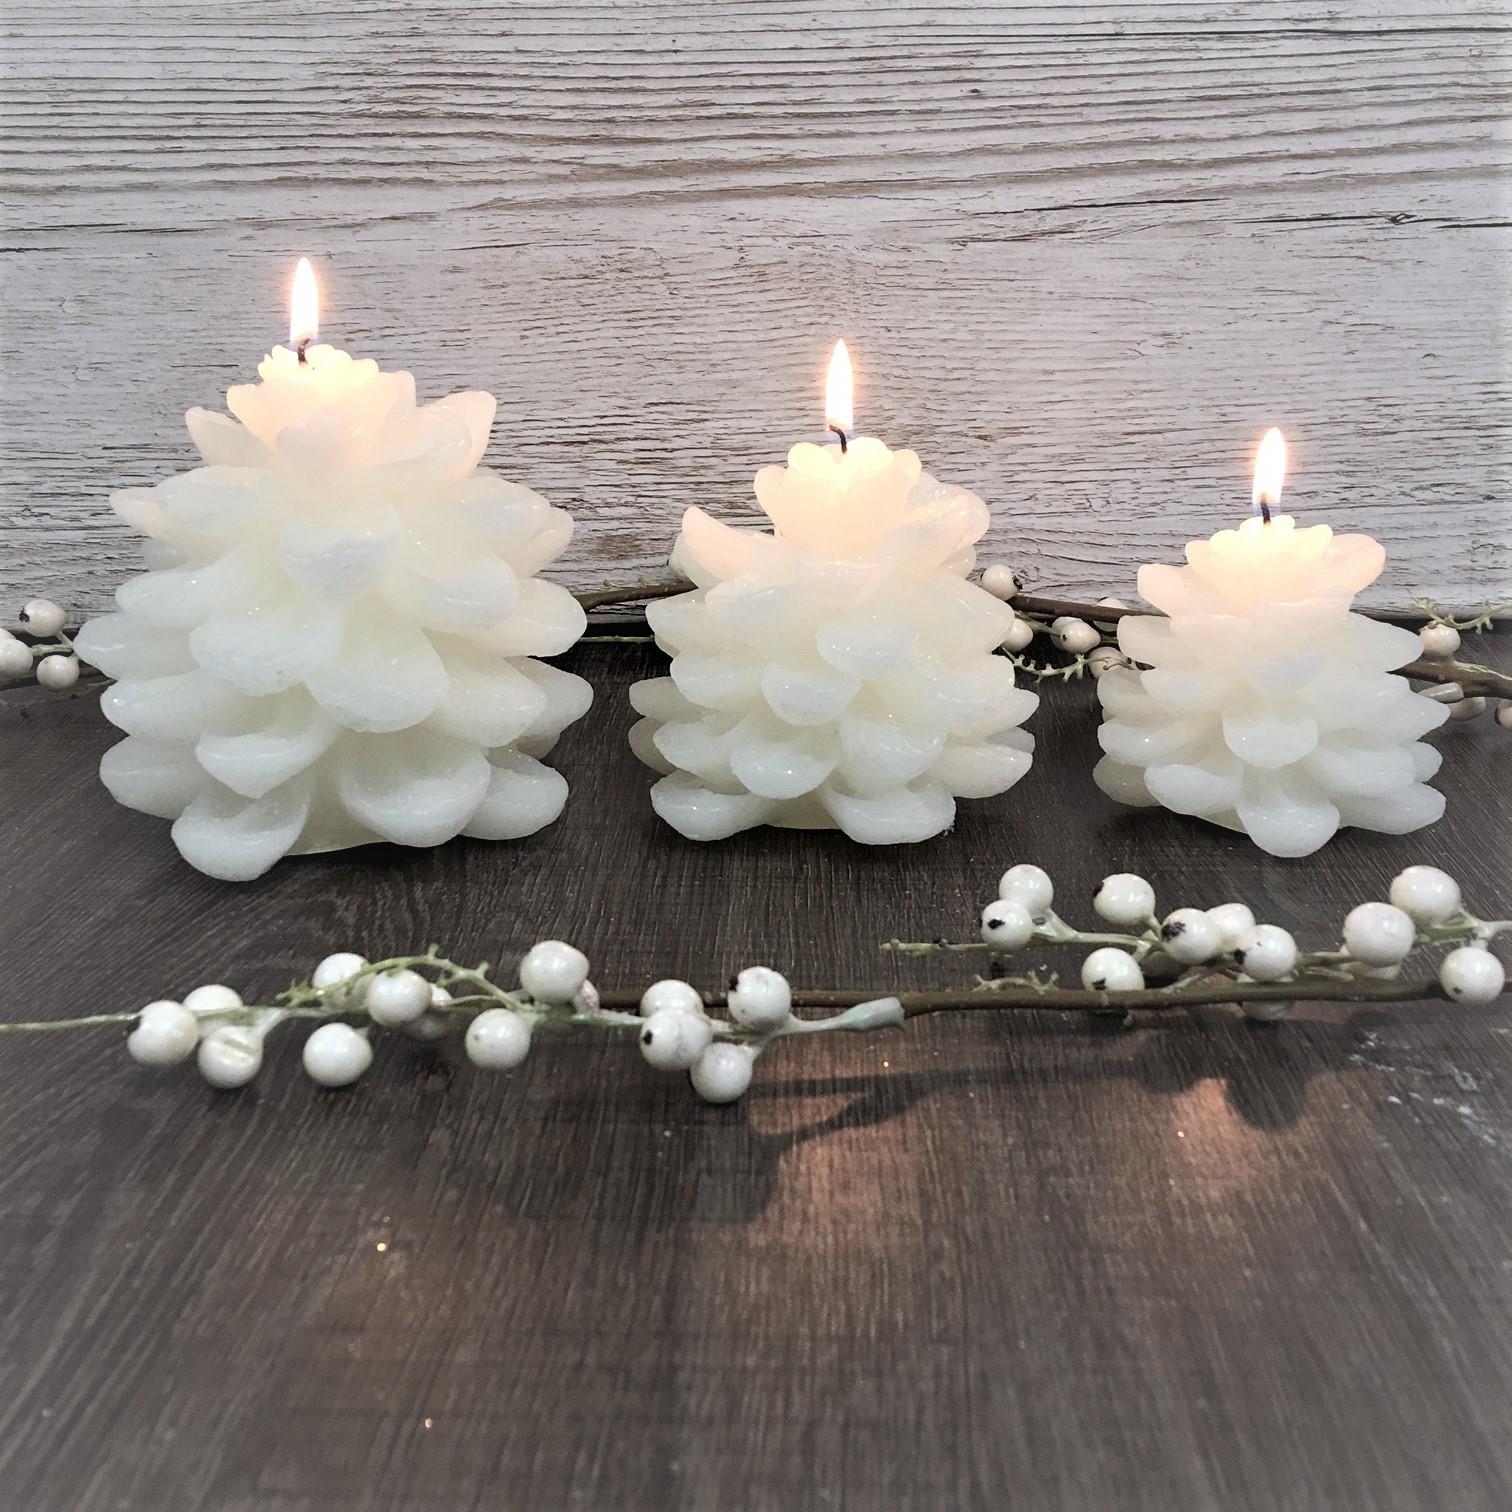 Snowy Pine Cone Candle Set Tutti Decor Ltd Lene Bjerre